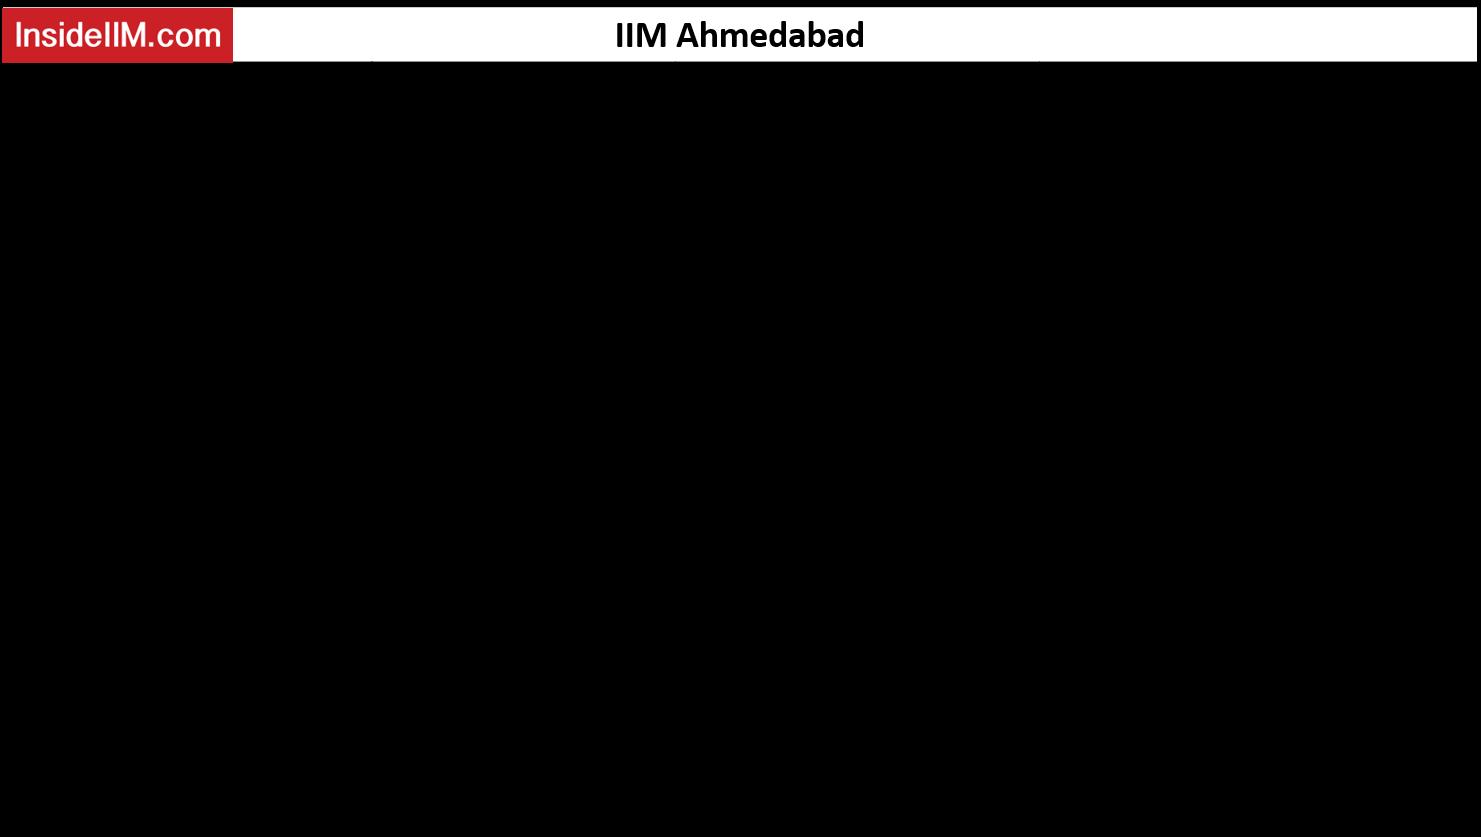 IIM Ahmedabad Academic Profile Requirements